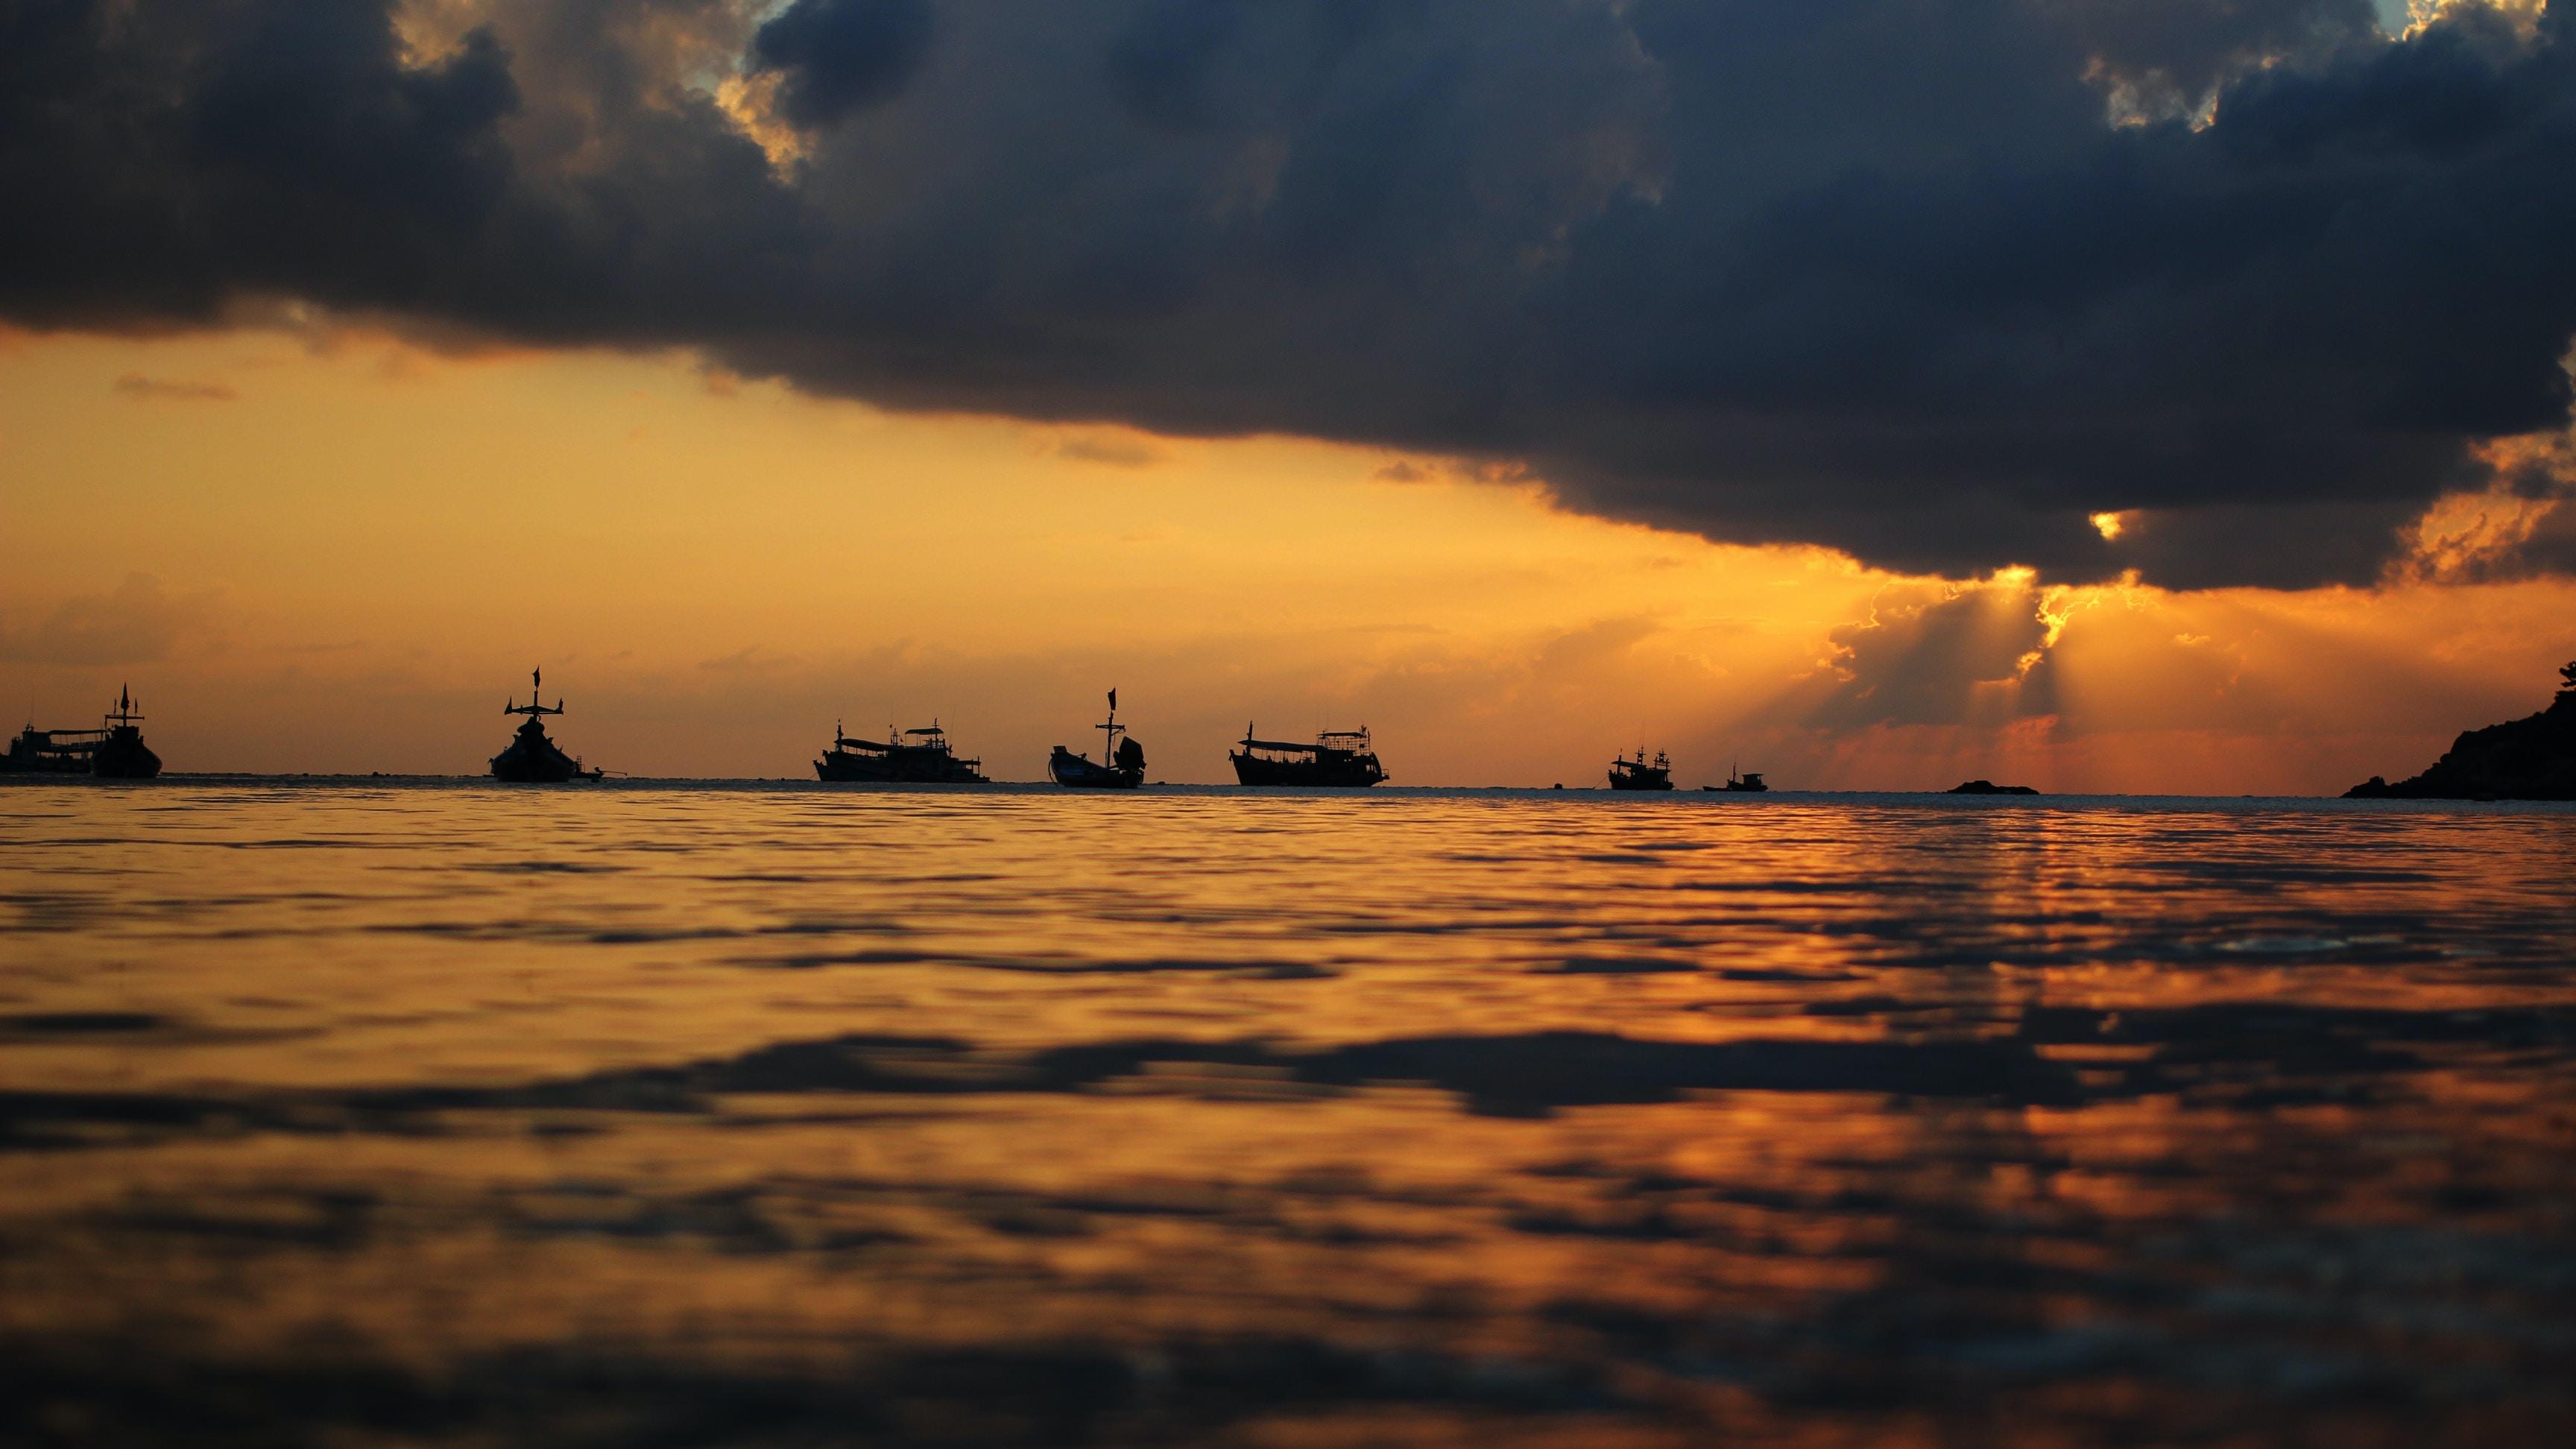 landscape photography of group of ships under golden hour